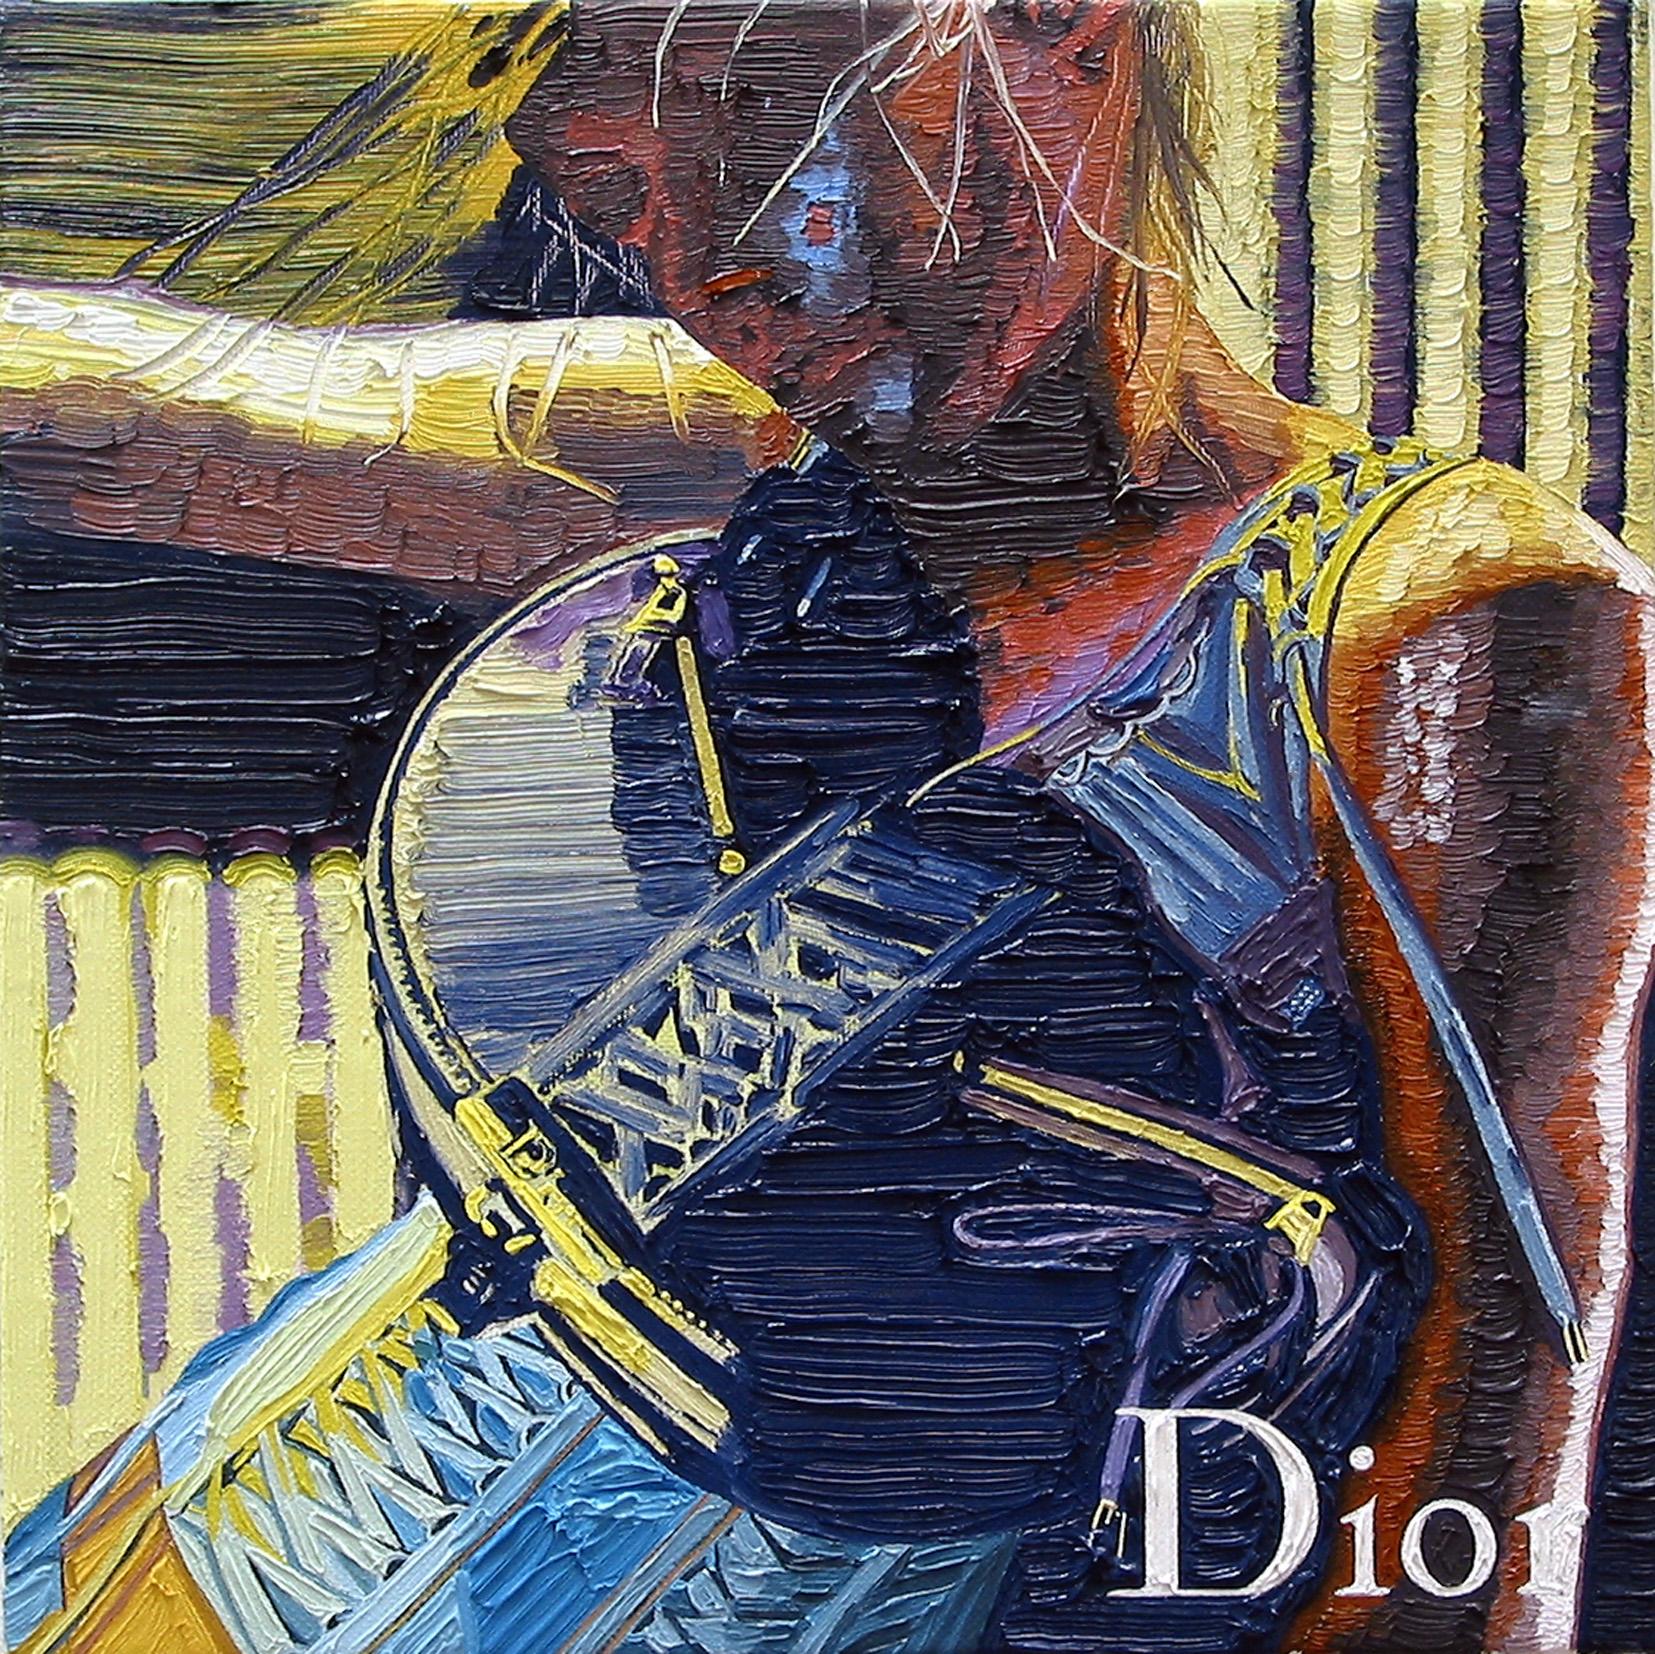 Dior.jpg